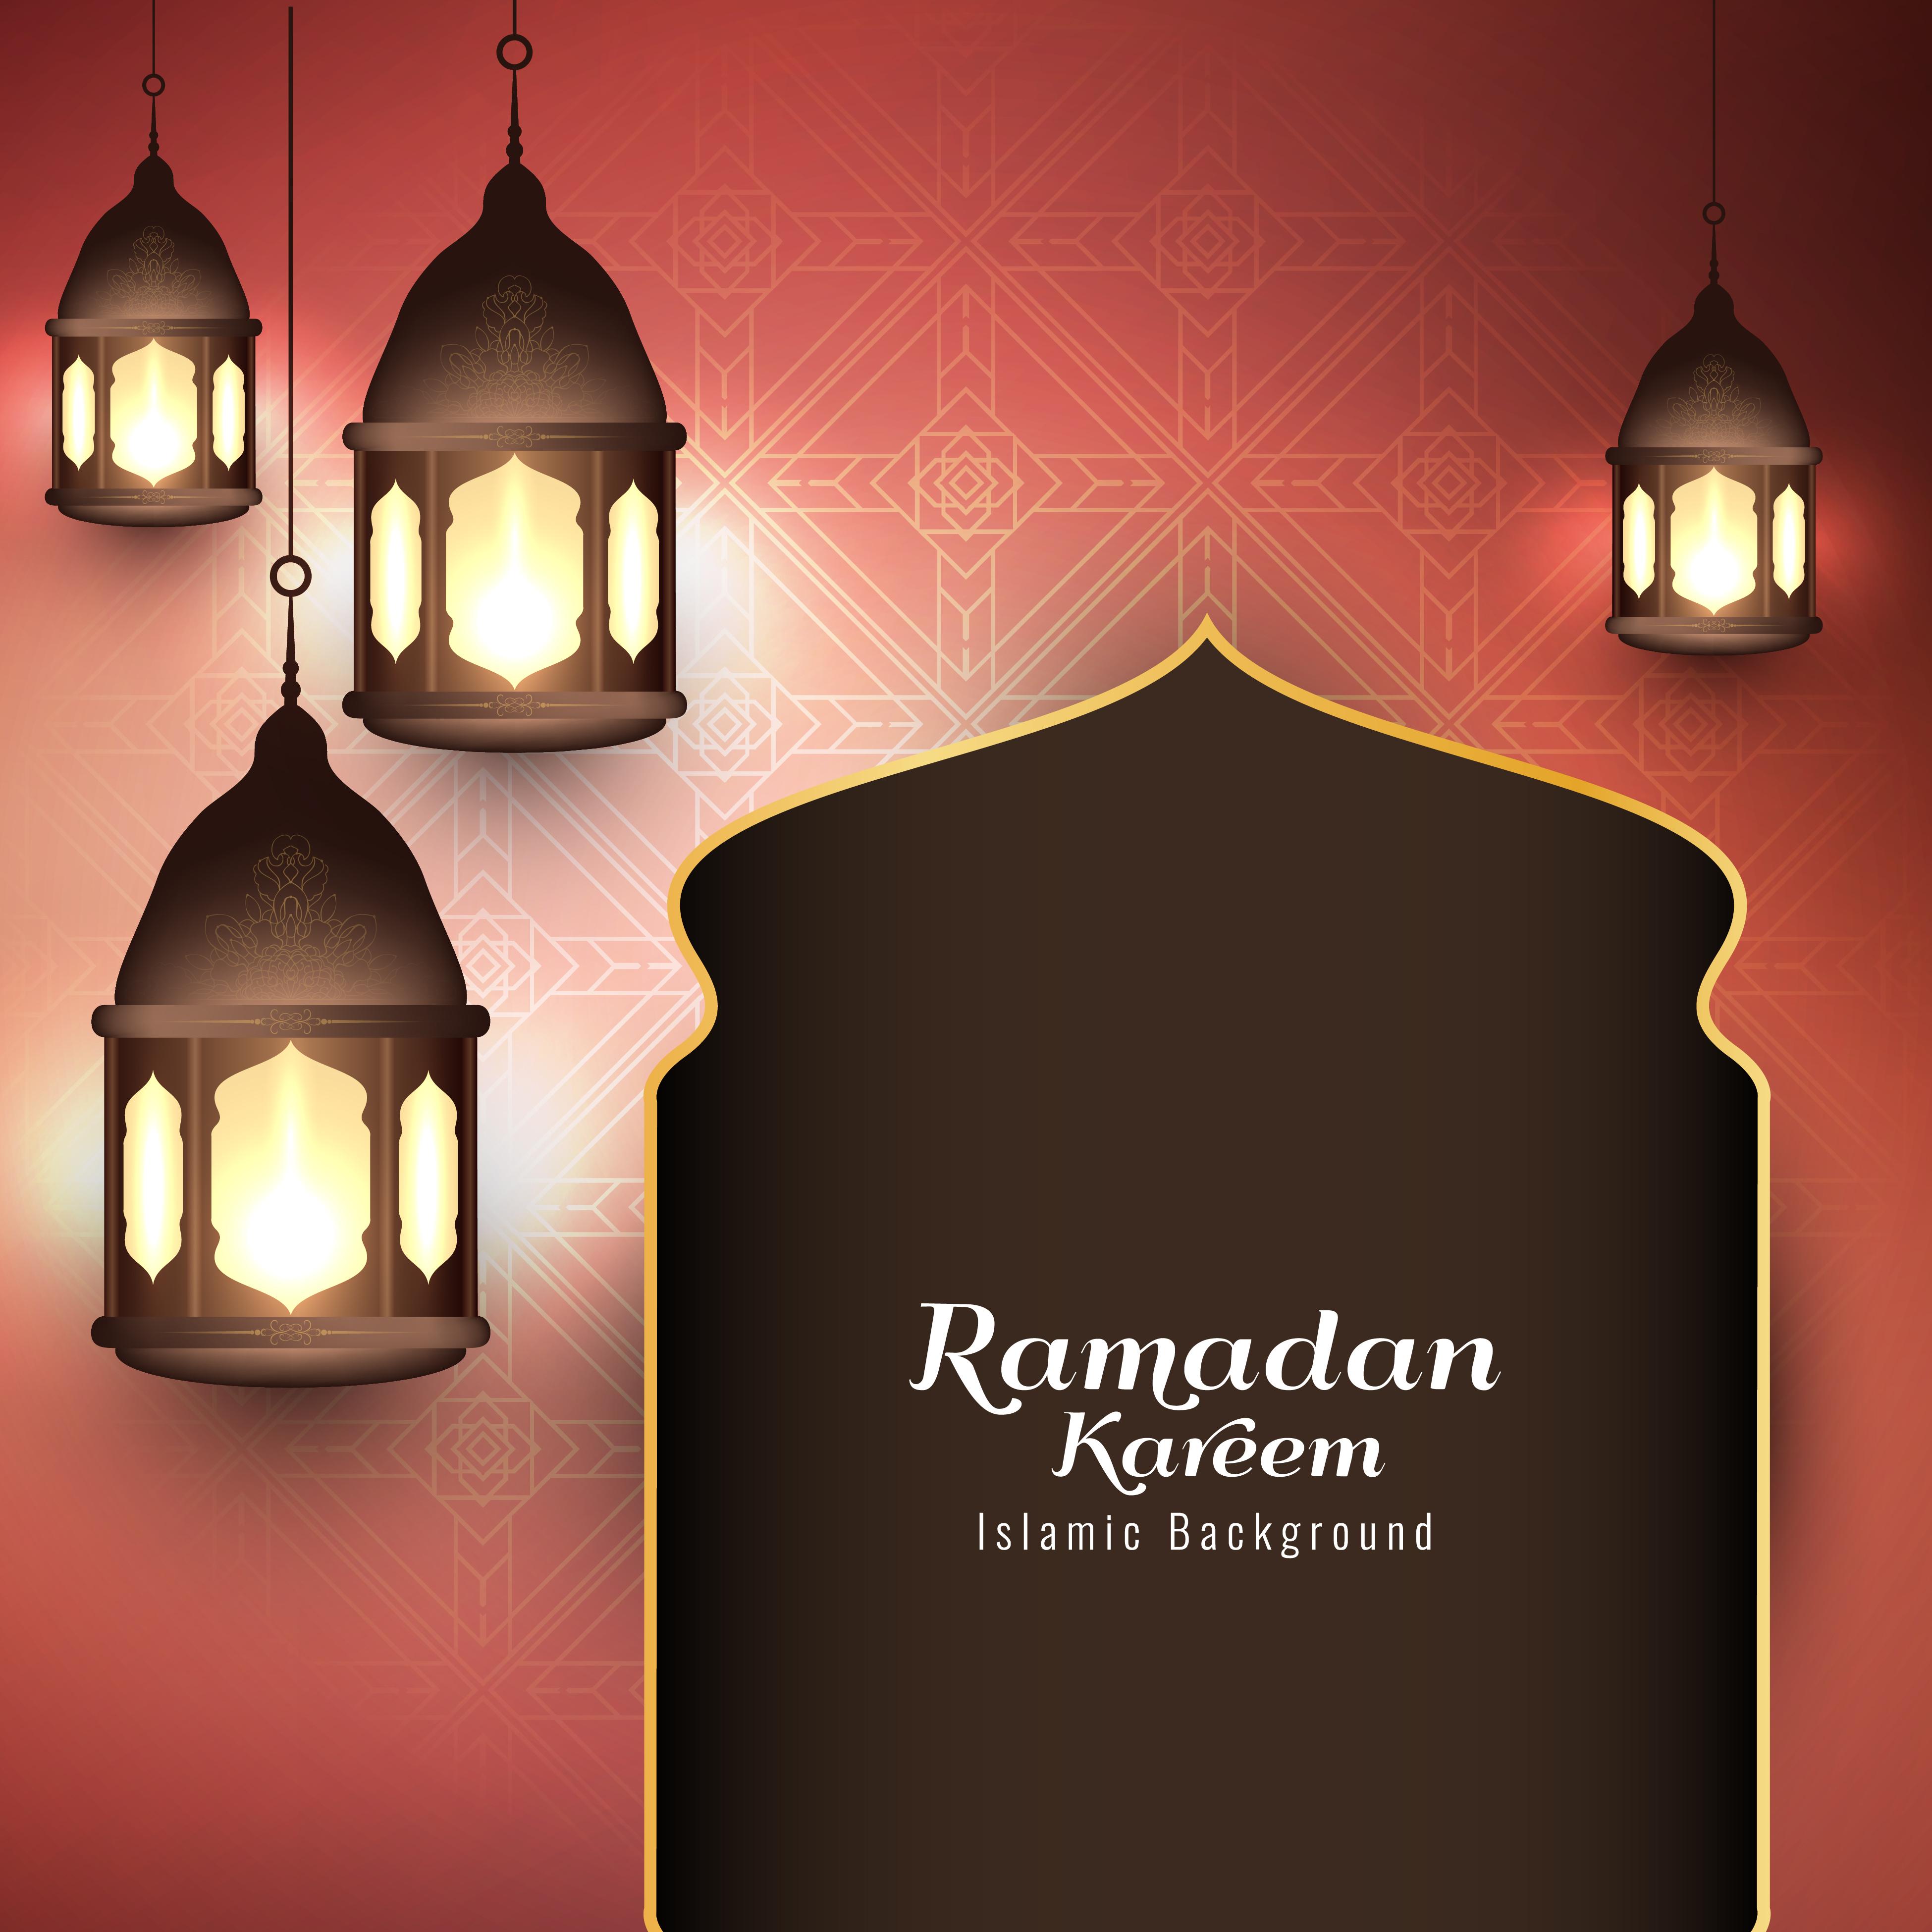 Abstract Ramadan Kareem Islamic Religious Background